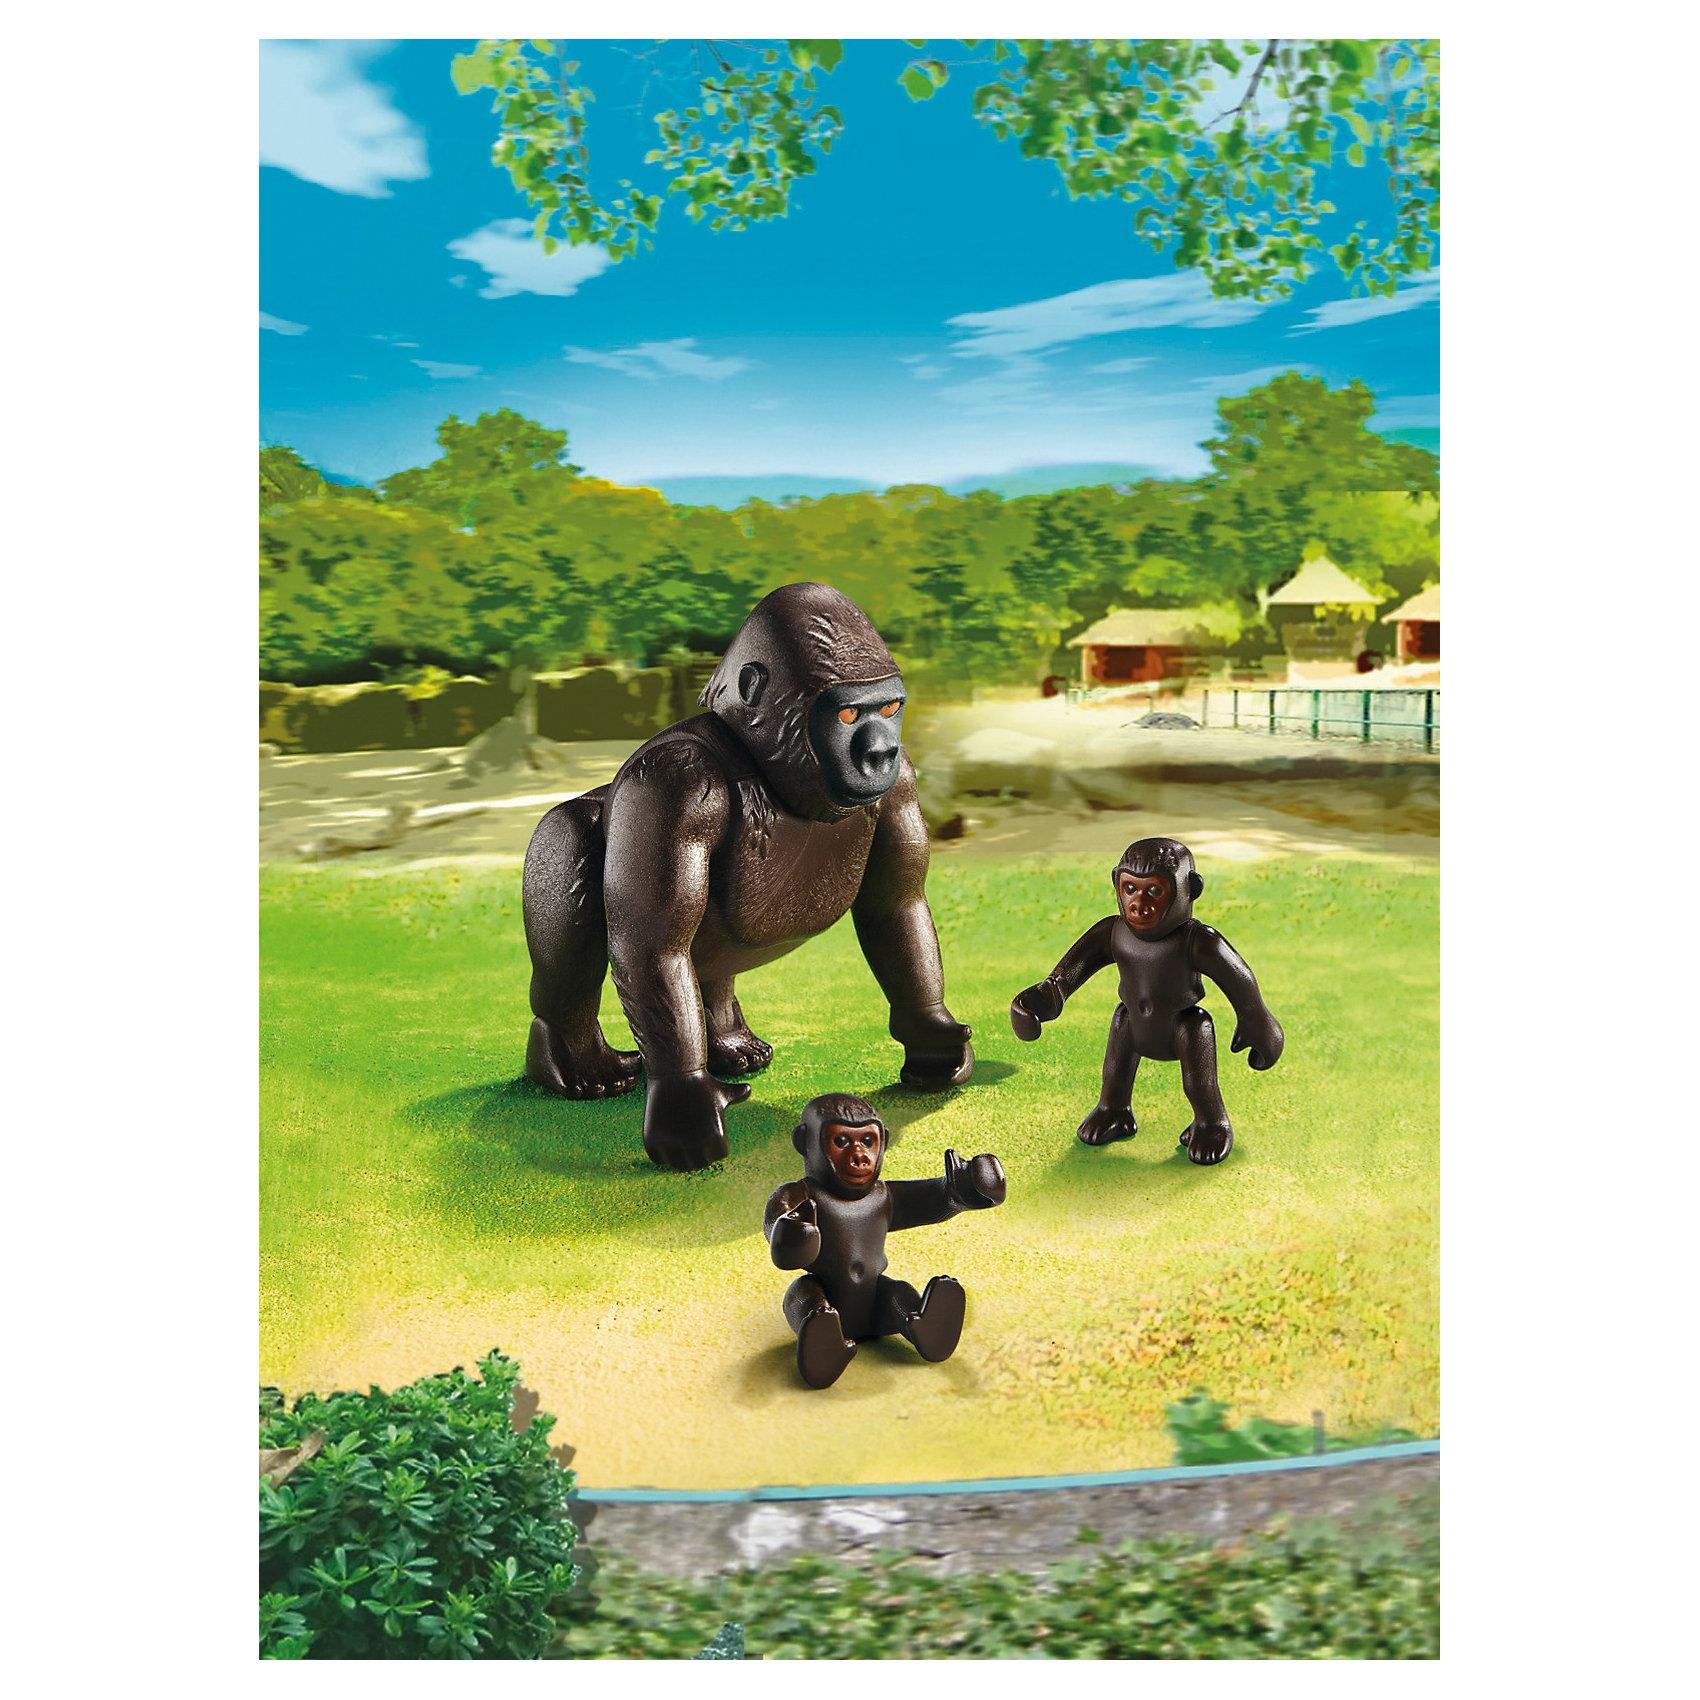 PLAYMOBIL® Зоопарк: Горилла со своими детенышами, PLAYMOBIL фигурки игрушки playmobil зоопарк стая фламинго